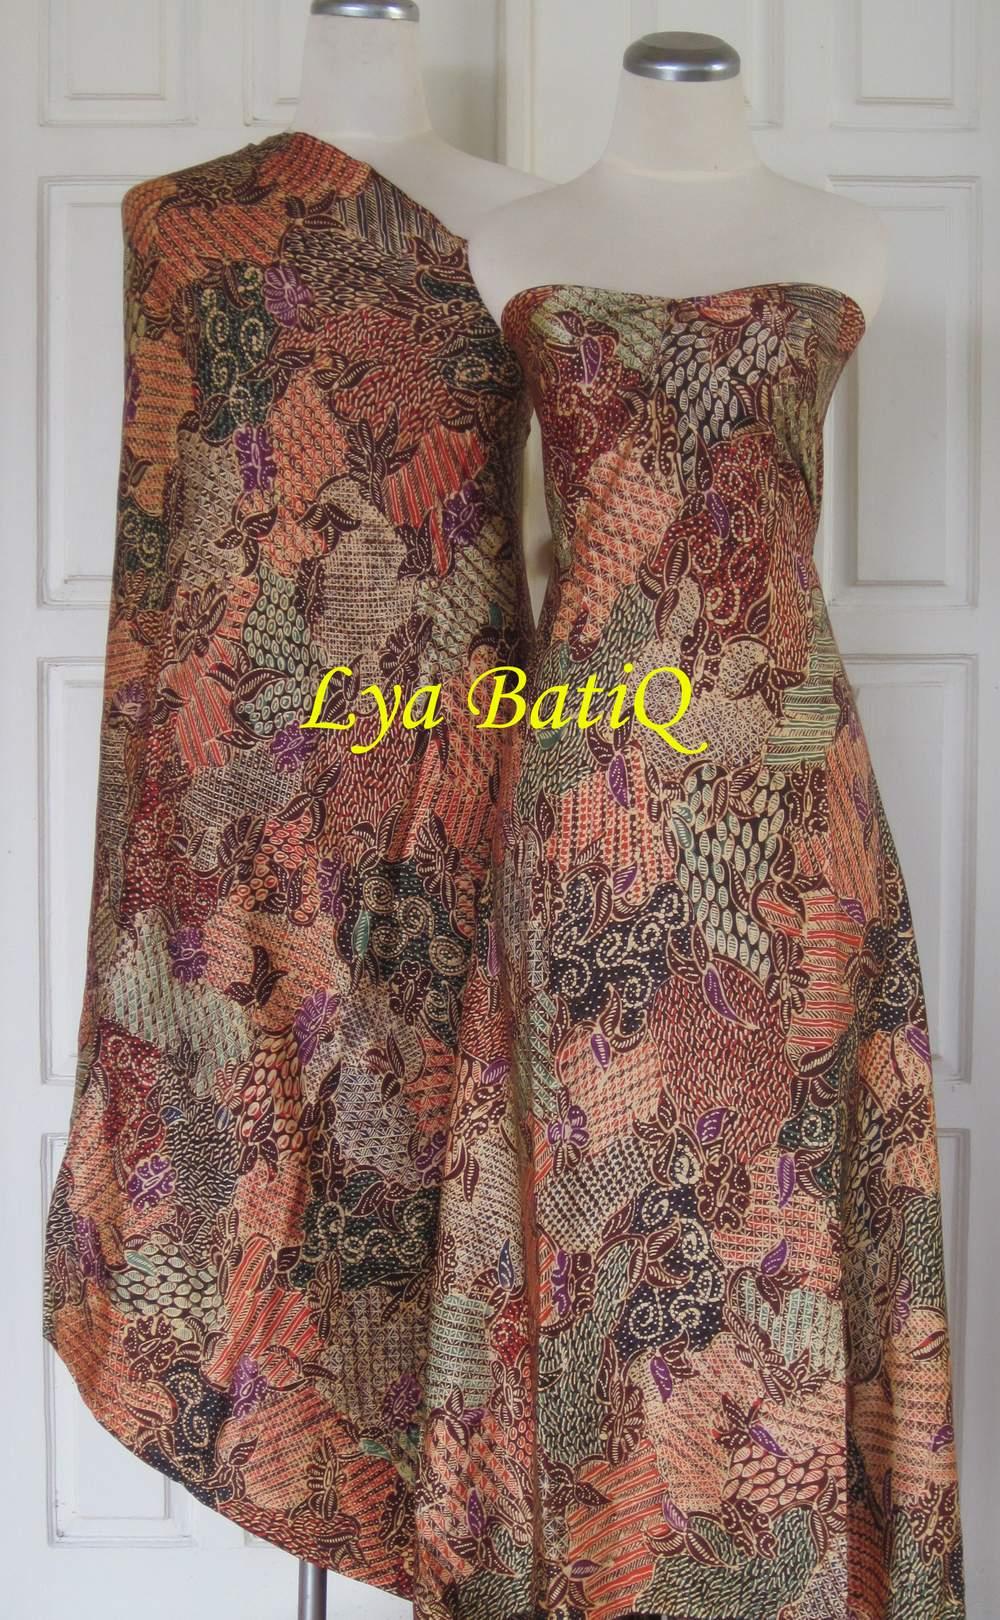 kain batik madura  Kain  Kemeja  Batik Madura  Baju  Kerja